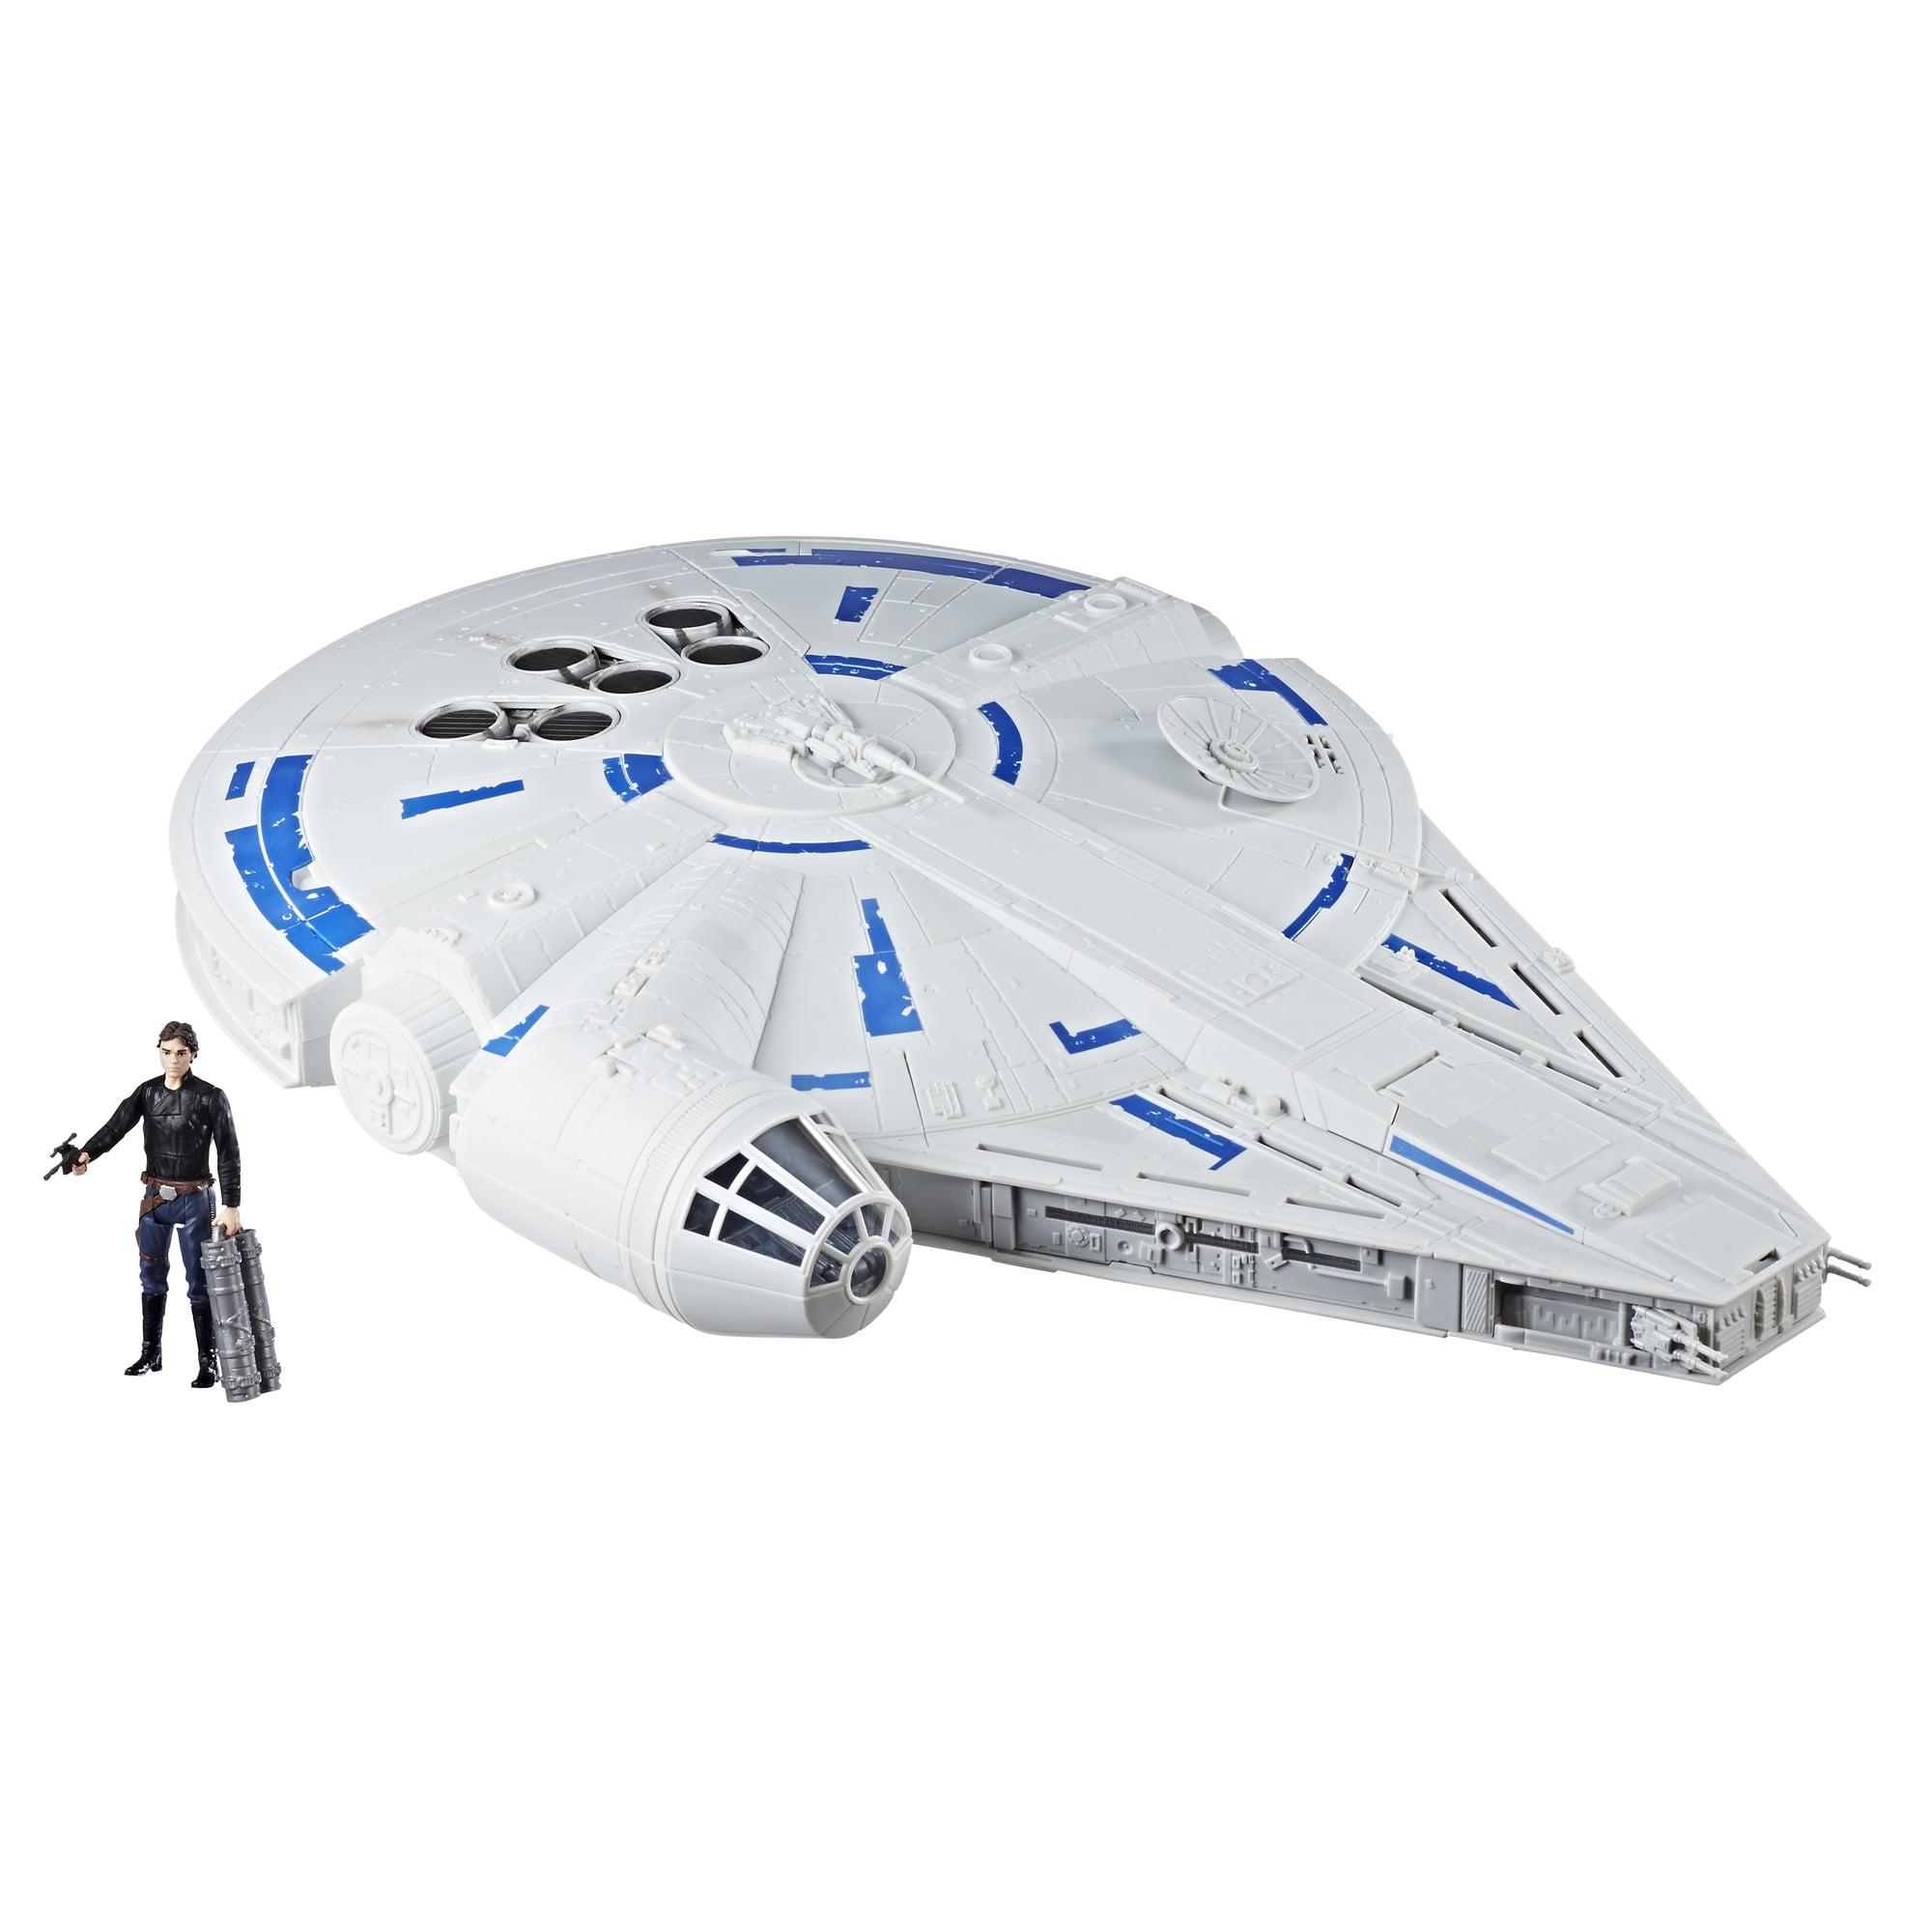 Star Wars Force Link 2.0 Kessel Run Millennium Falcon with Han Solo Figure by Hasbro